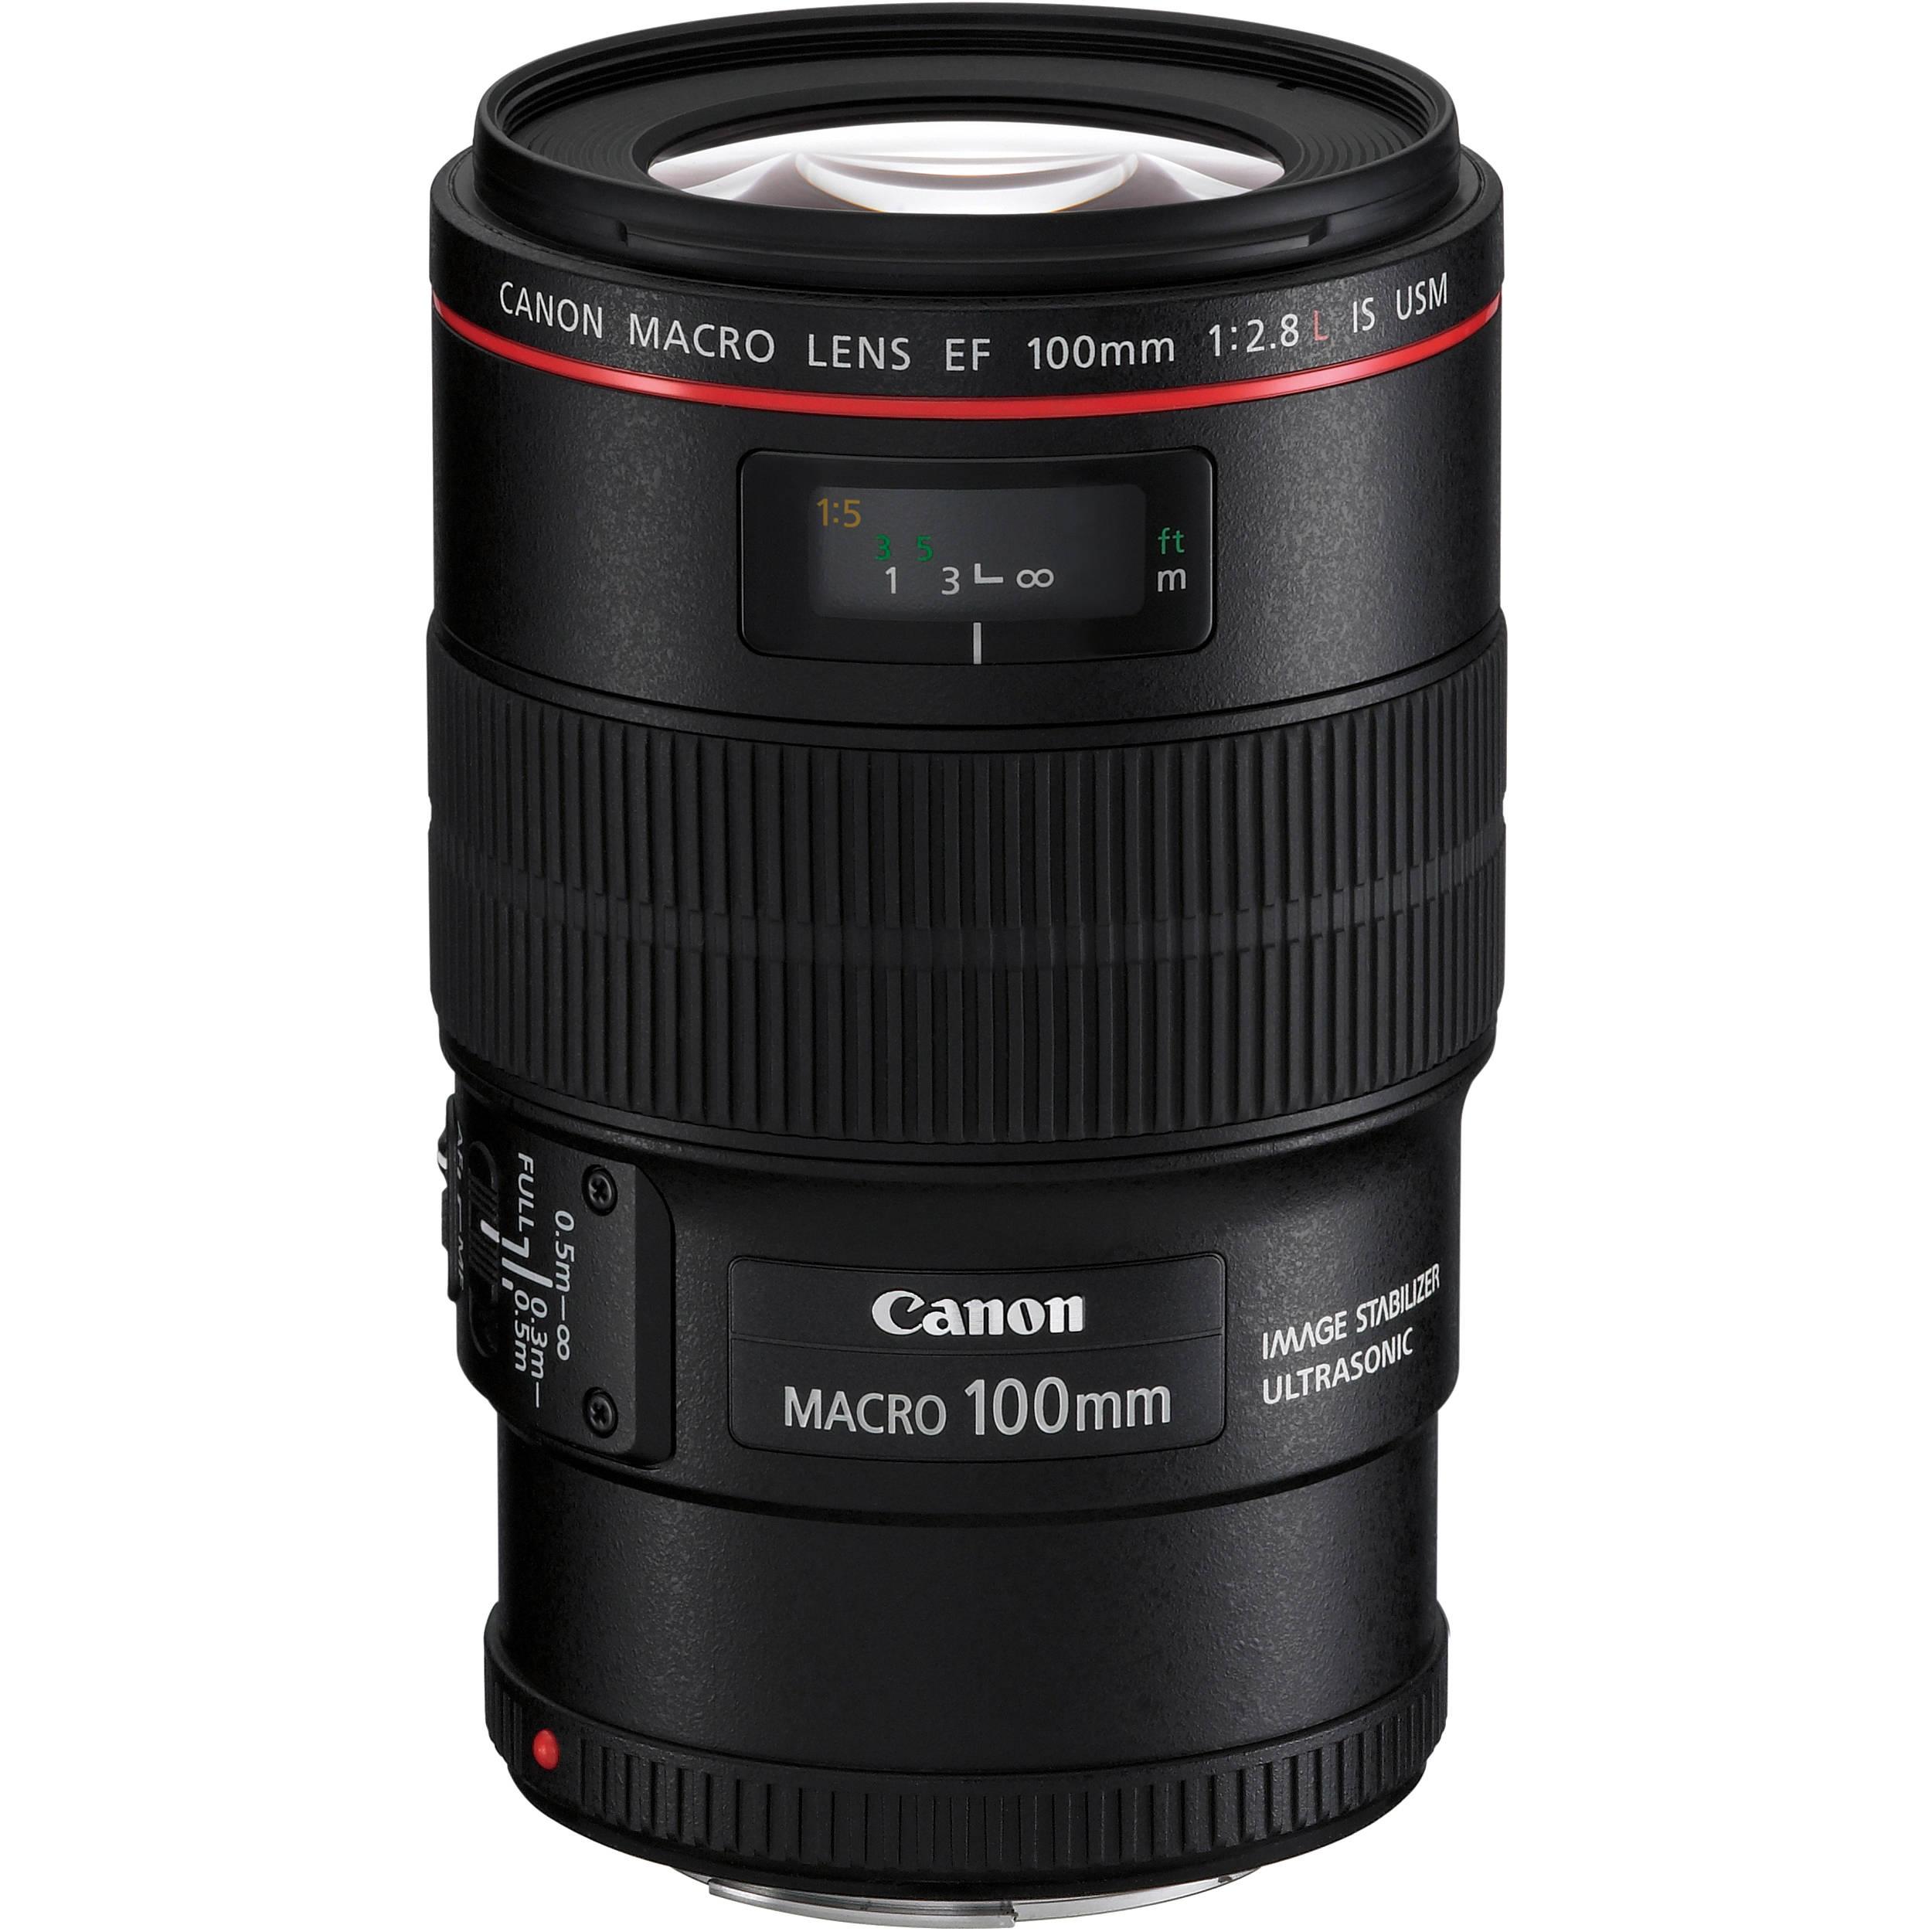 Canon_3554B002_EF_100mm_f_2_8L_Macro_647011.jpg